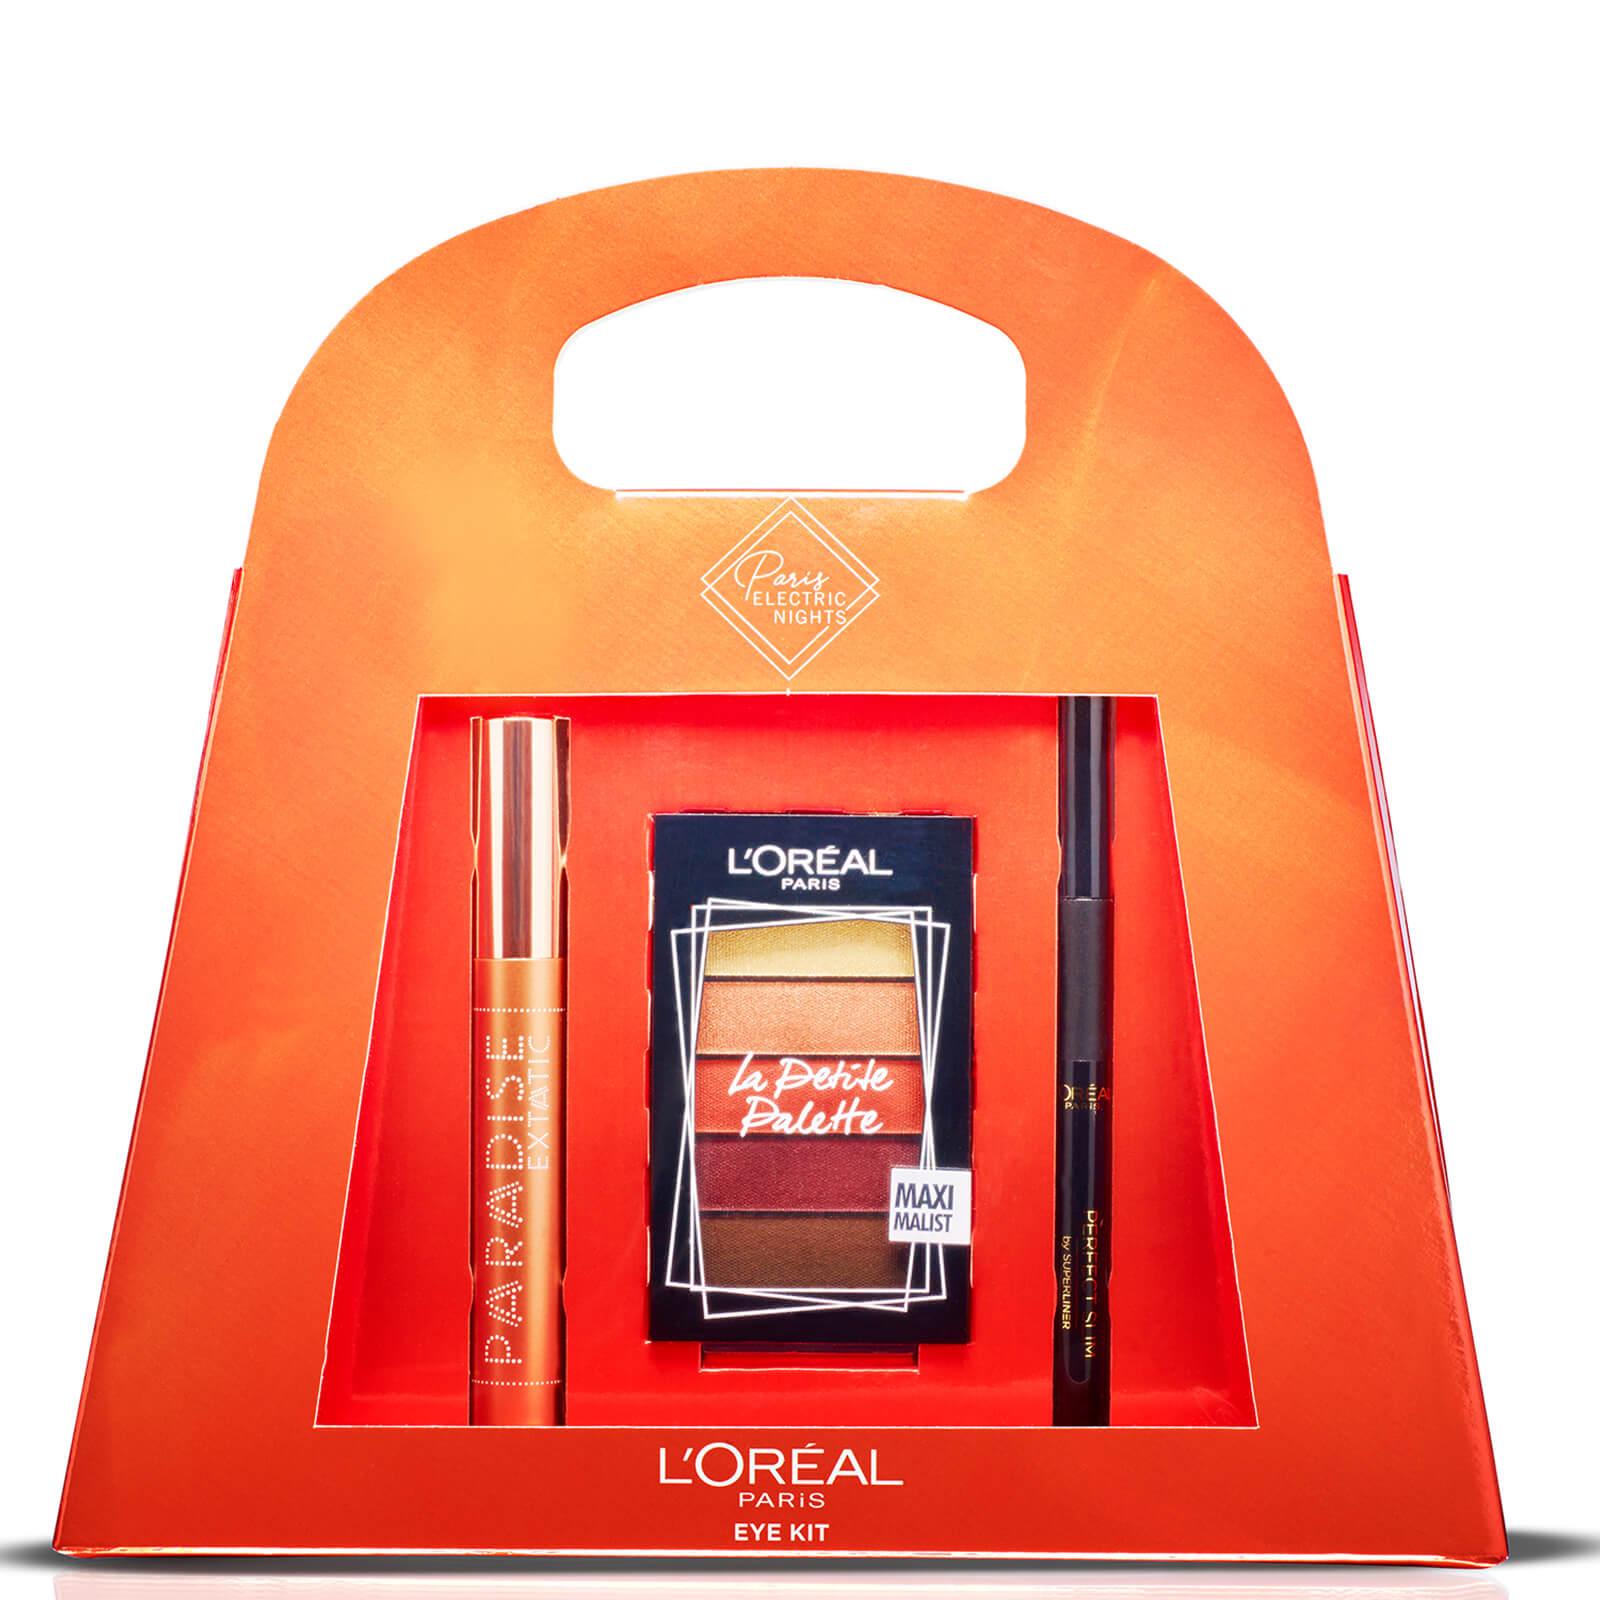 L'Oréal Paris Electric Nights Gift Set now £5.55 delivered @ Look Fantastic